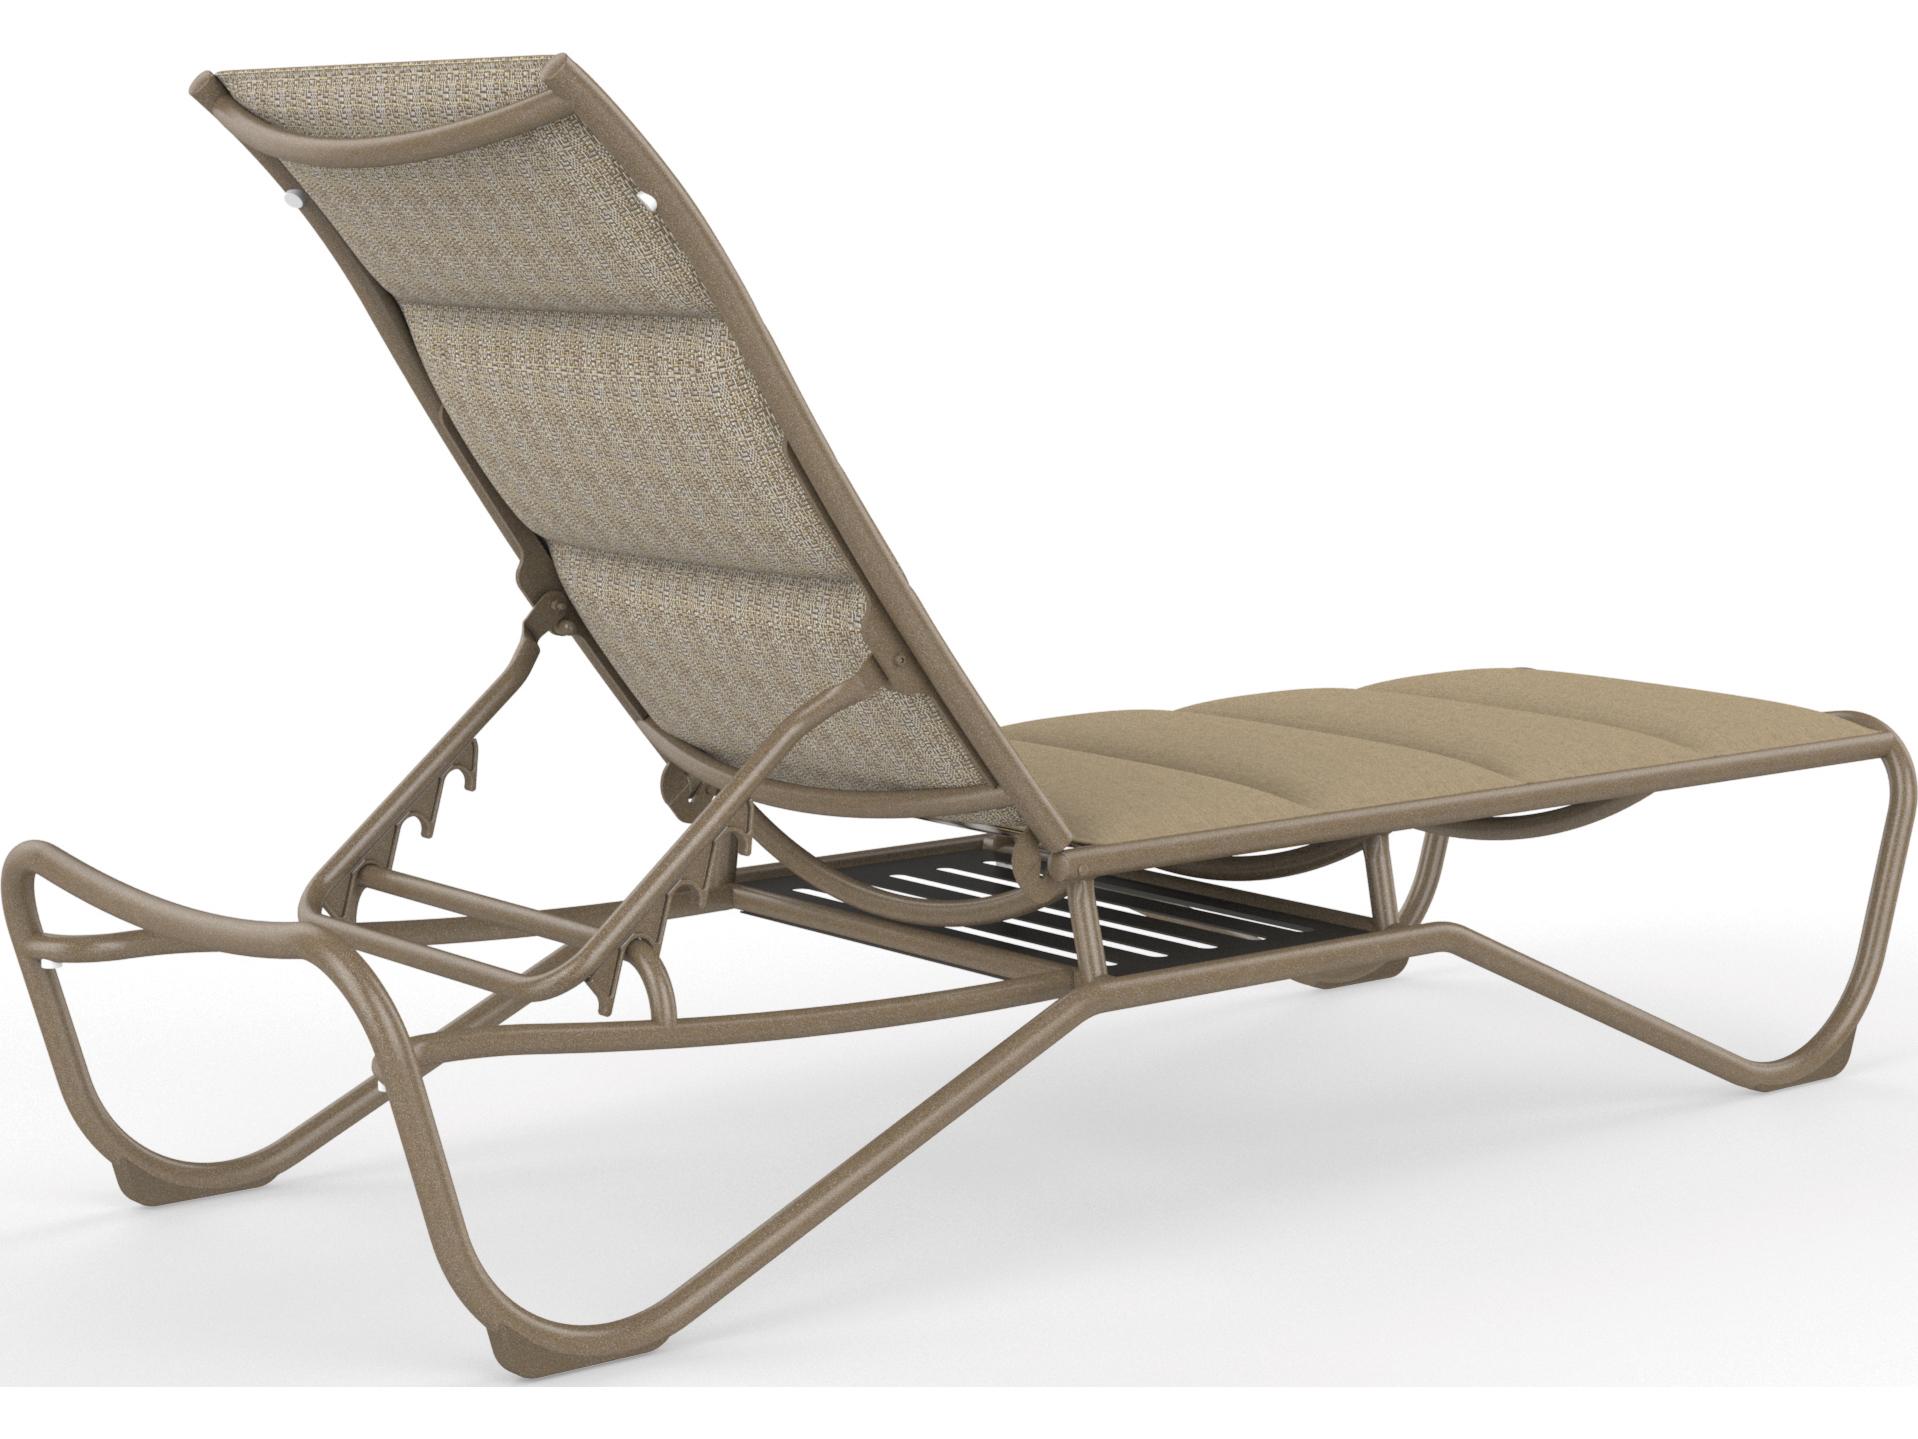 Tropitone milennia padded sling aluminum armless chaise for Armless chaise lounge